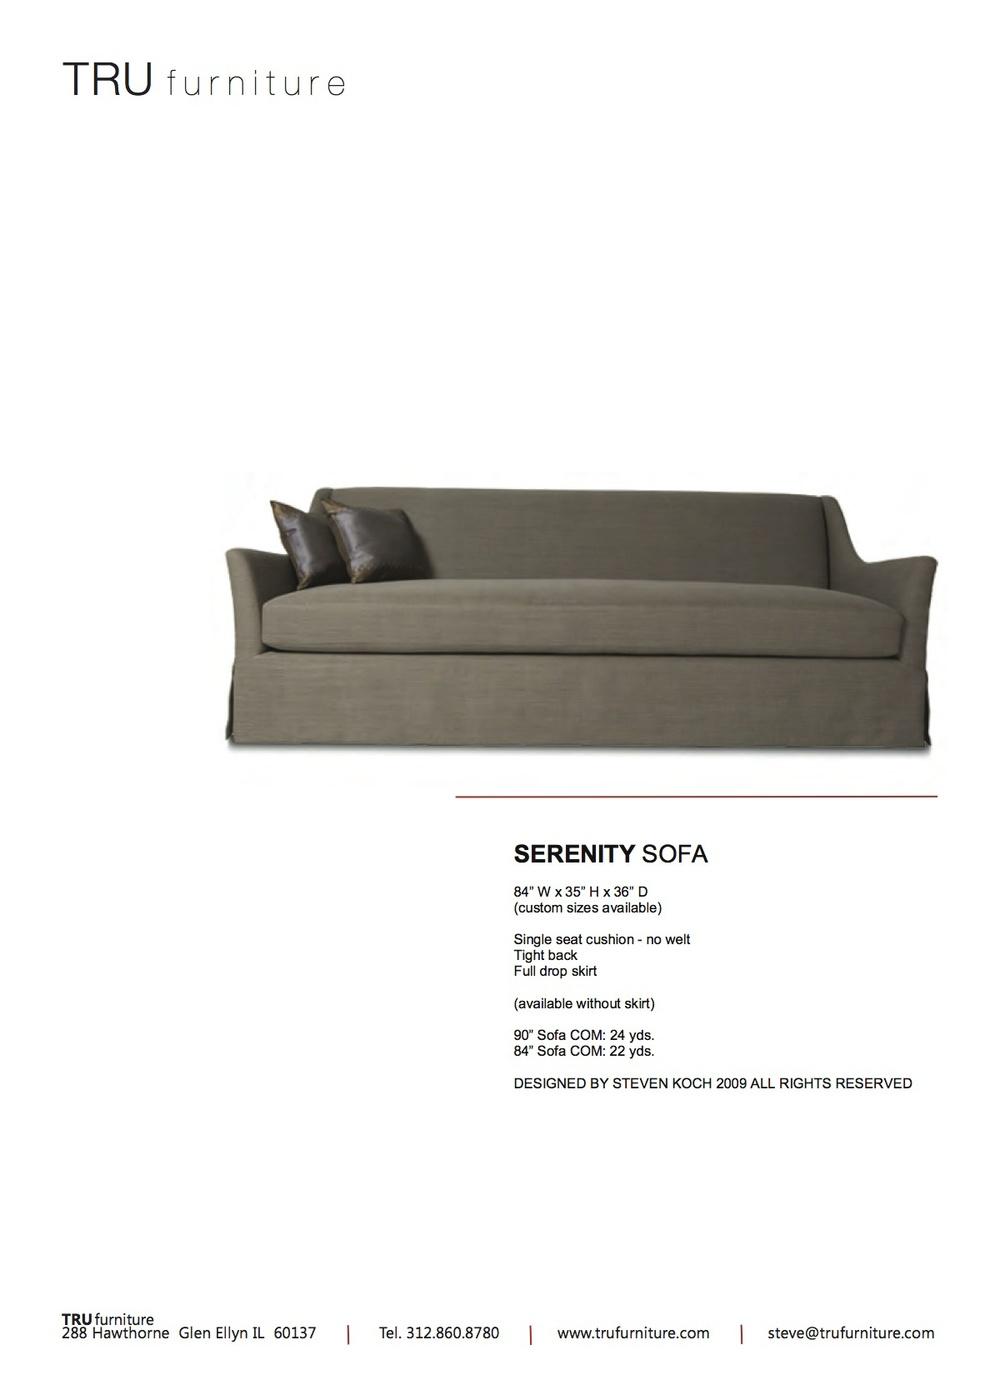 Serenity Sofa copy.jpg